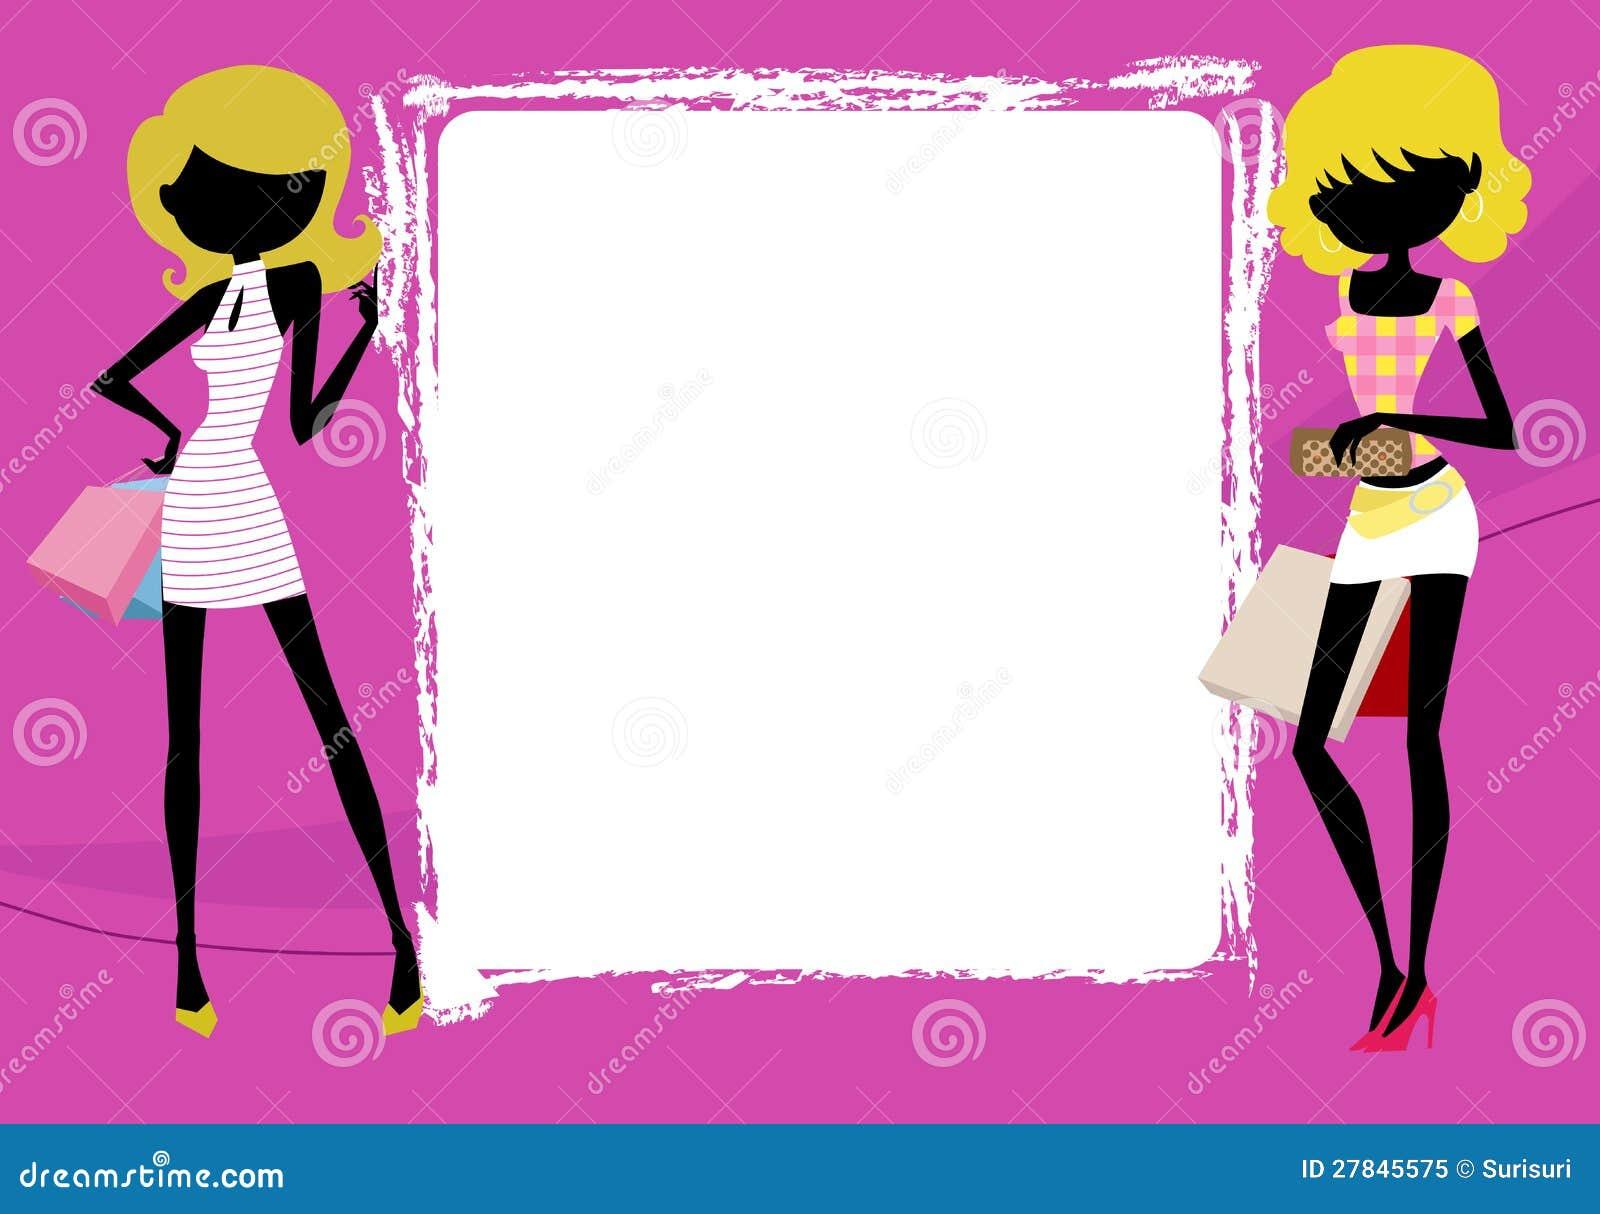 девушки в кадре